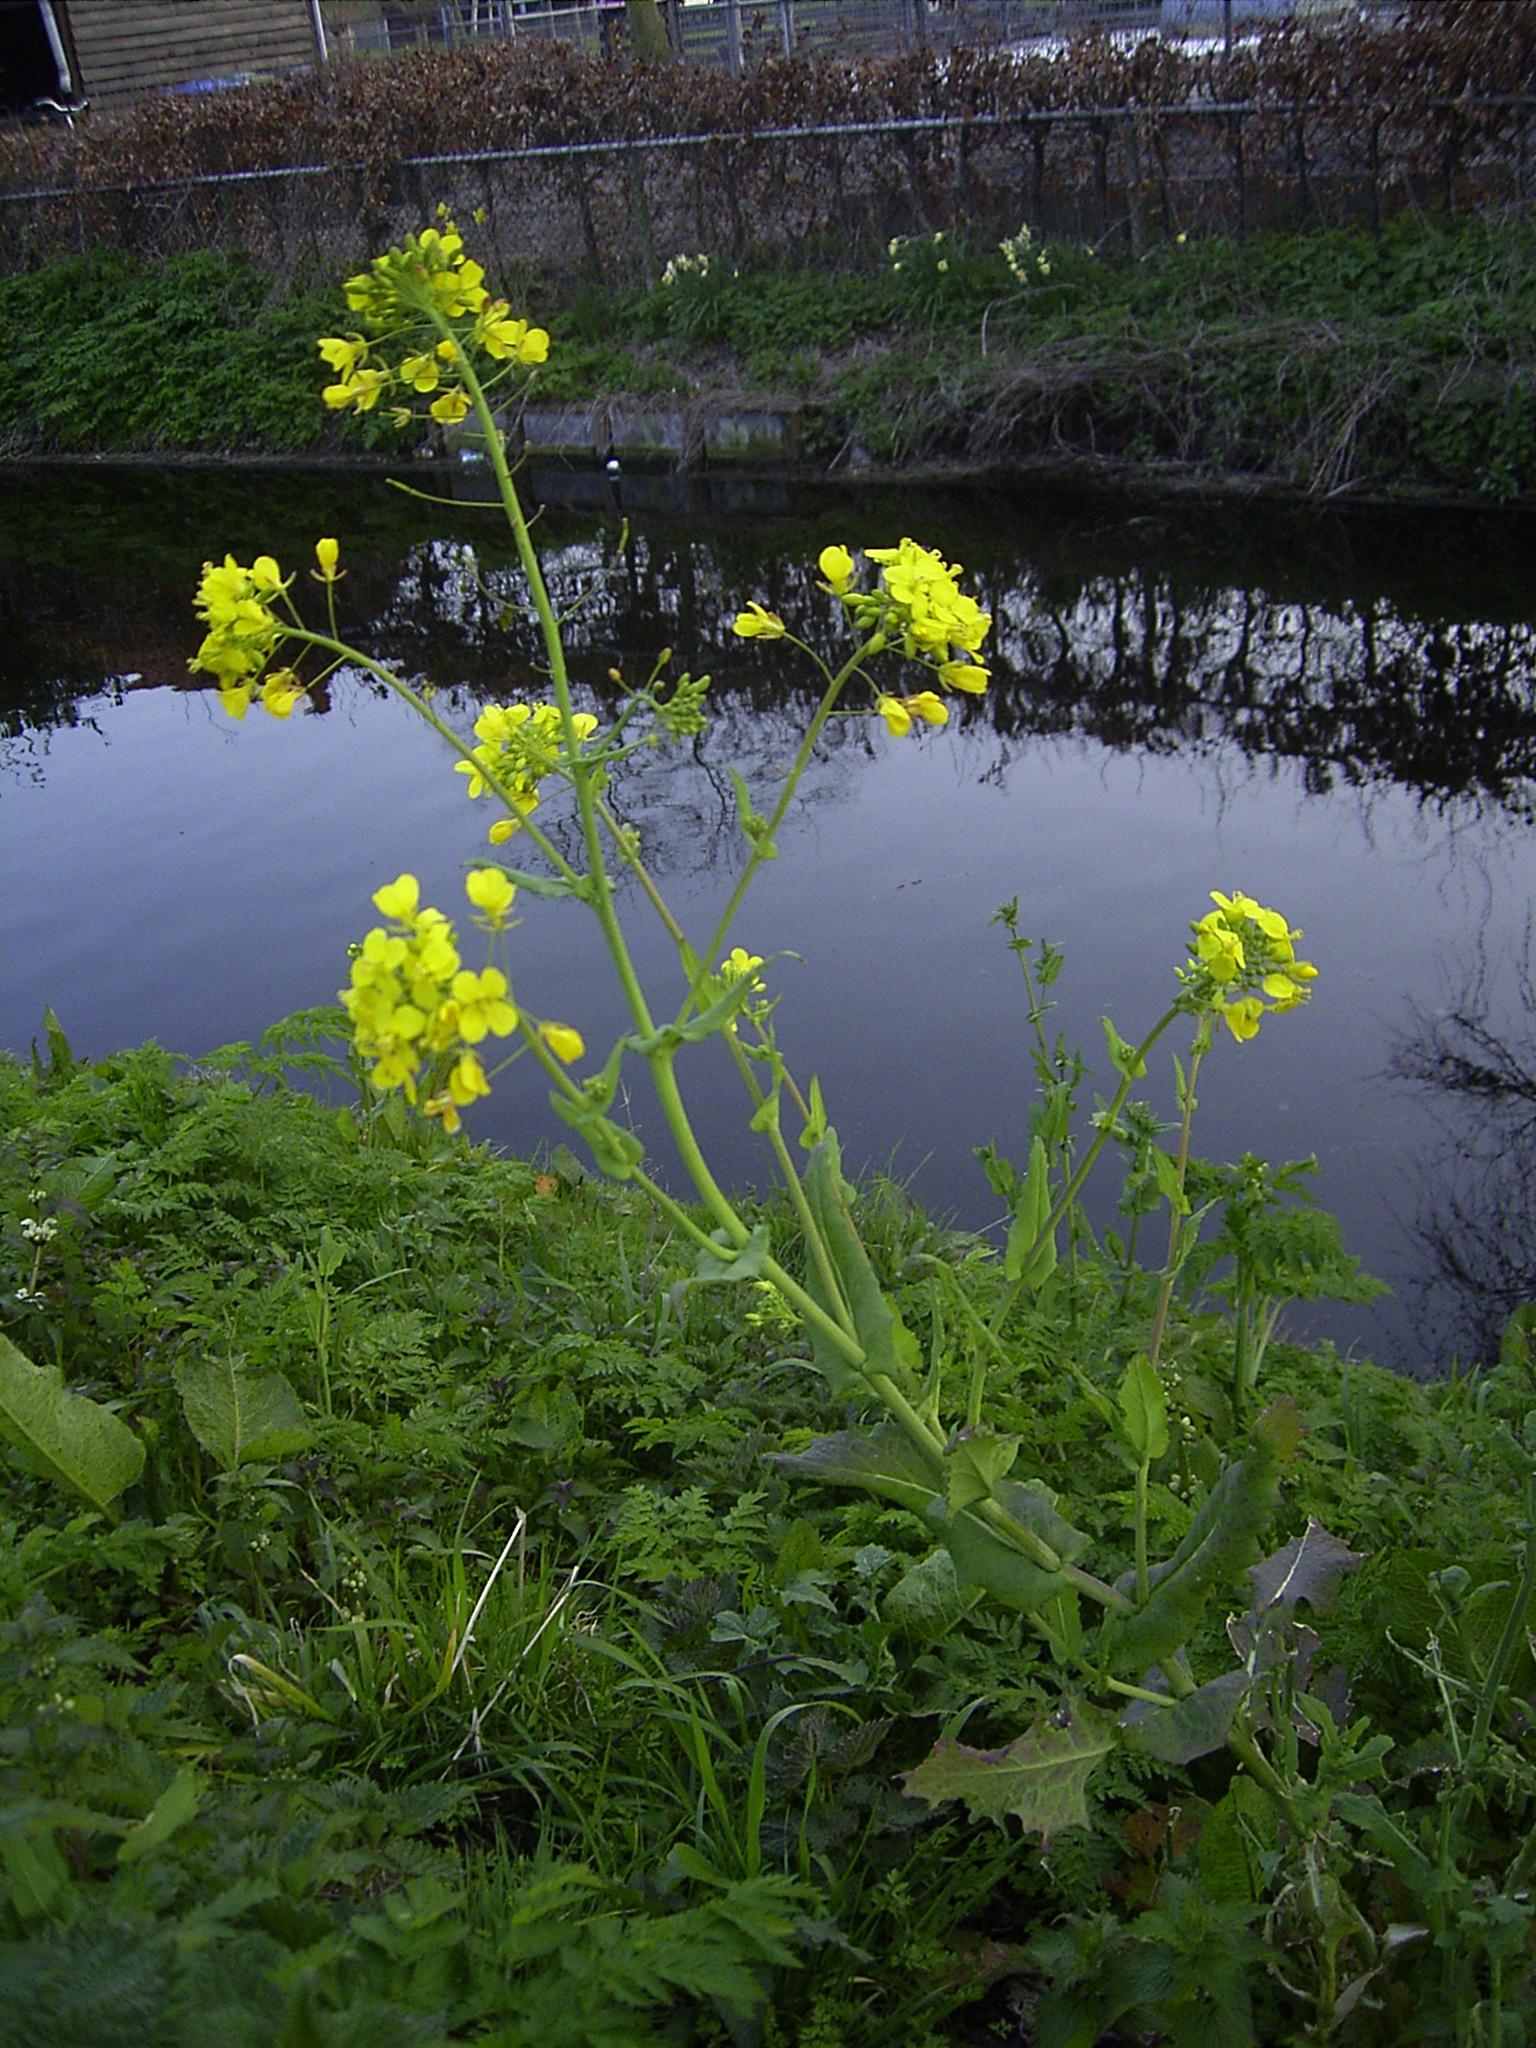 http://upload.wikimedia.org/wikipedia/commons/d/d9/Brassica_rapa_plant.jpg